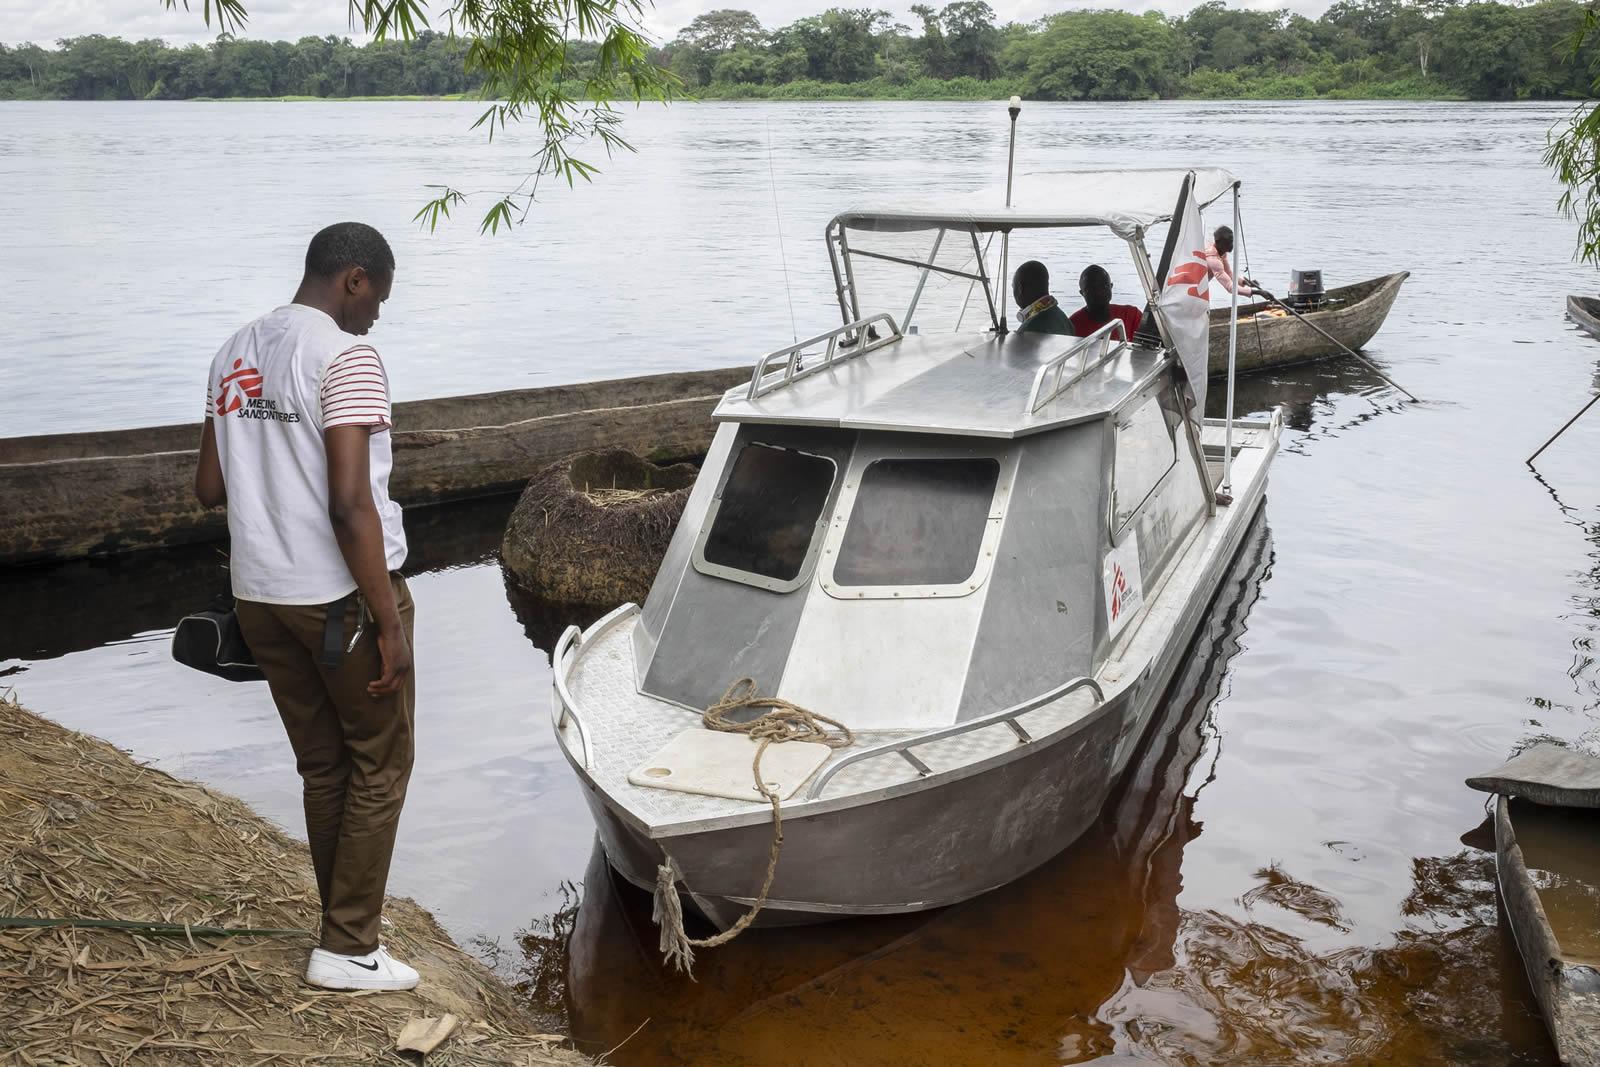 ebola-11-break-drc-boat-transport.jpg